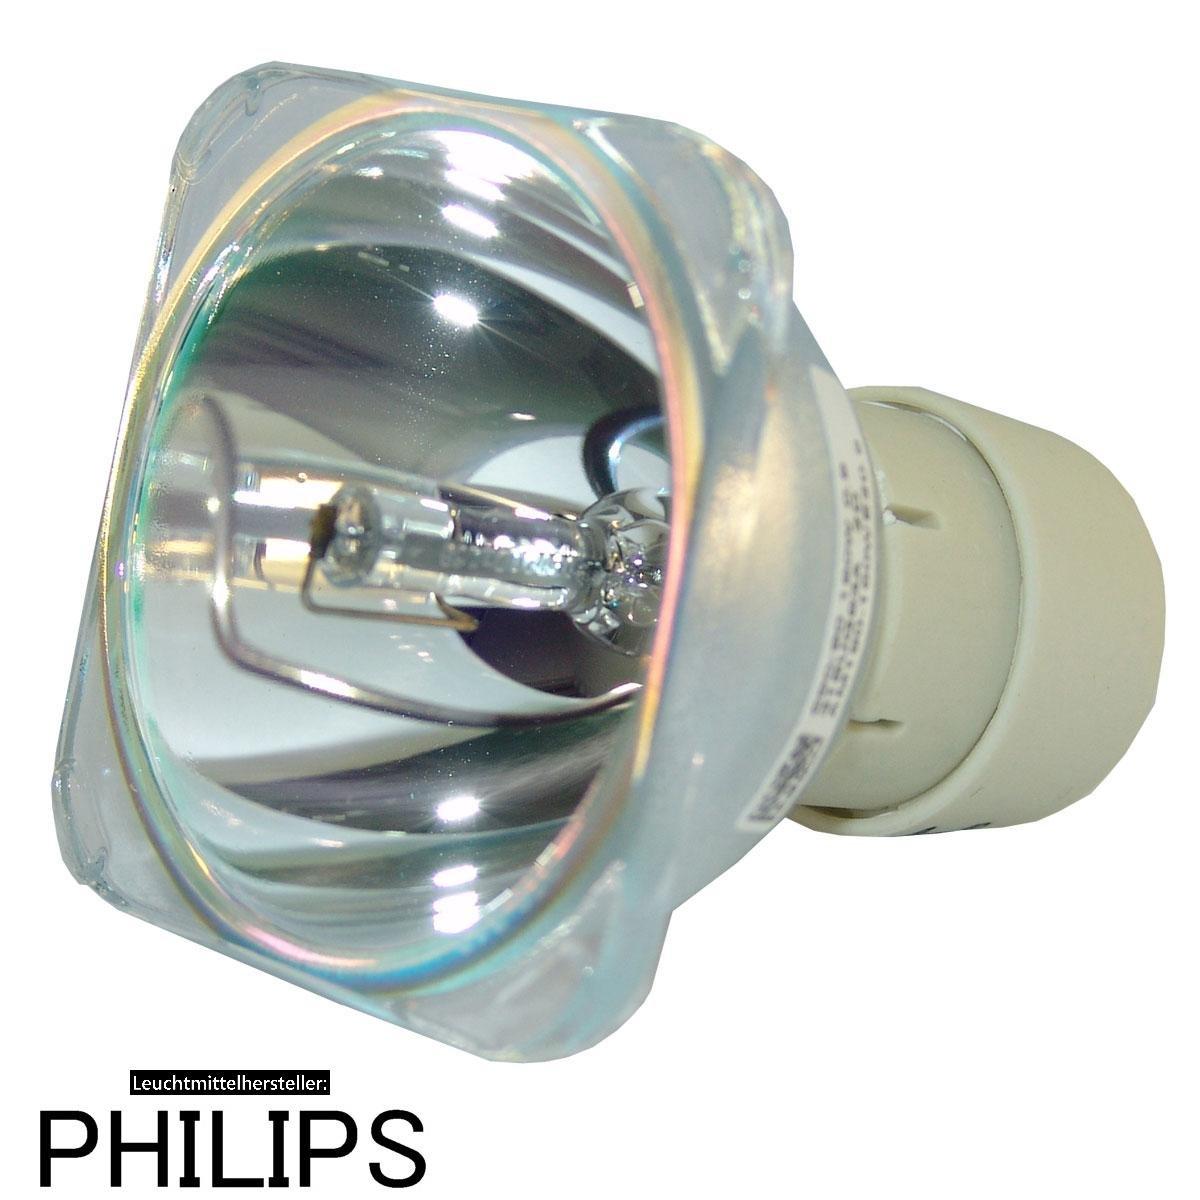 OPTOMA SP.8EH01GC01 - Lampe seule PHILIPS ECL-4980-BO/P